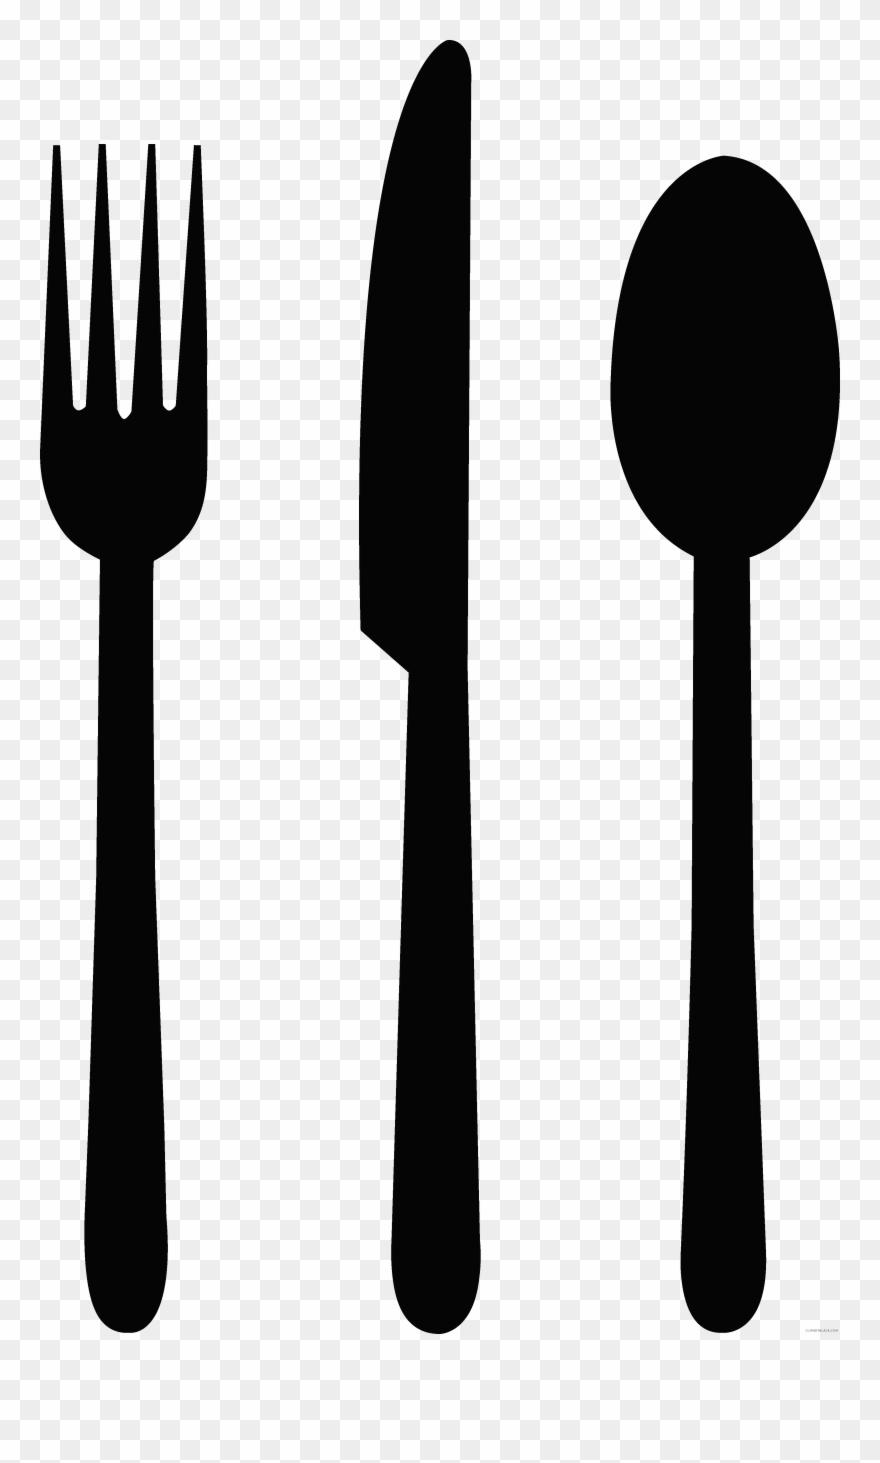 wooden-spoon # 5097522